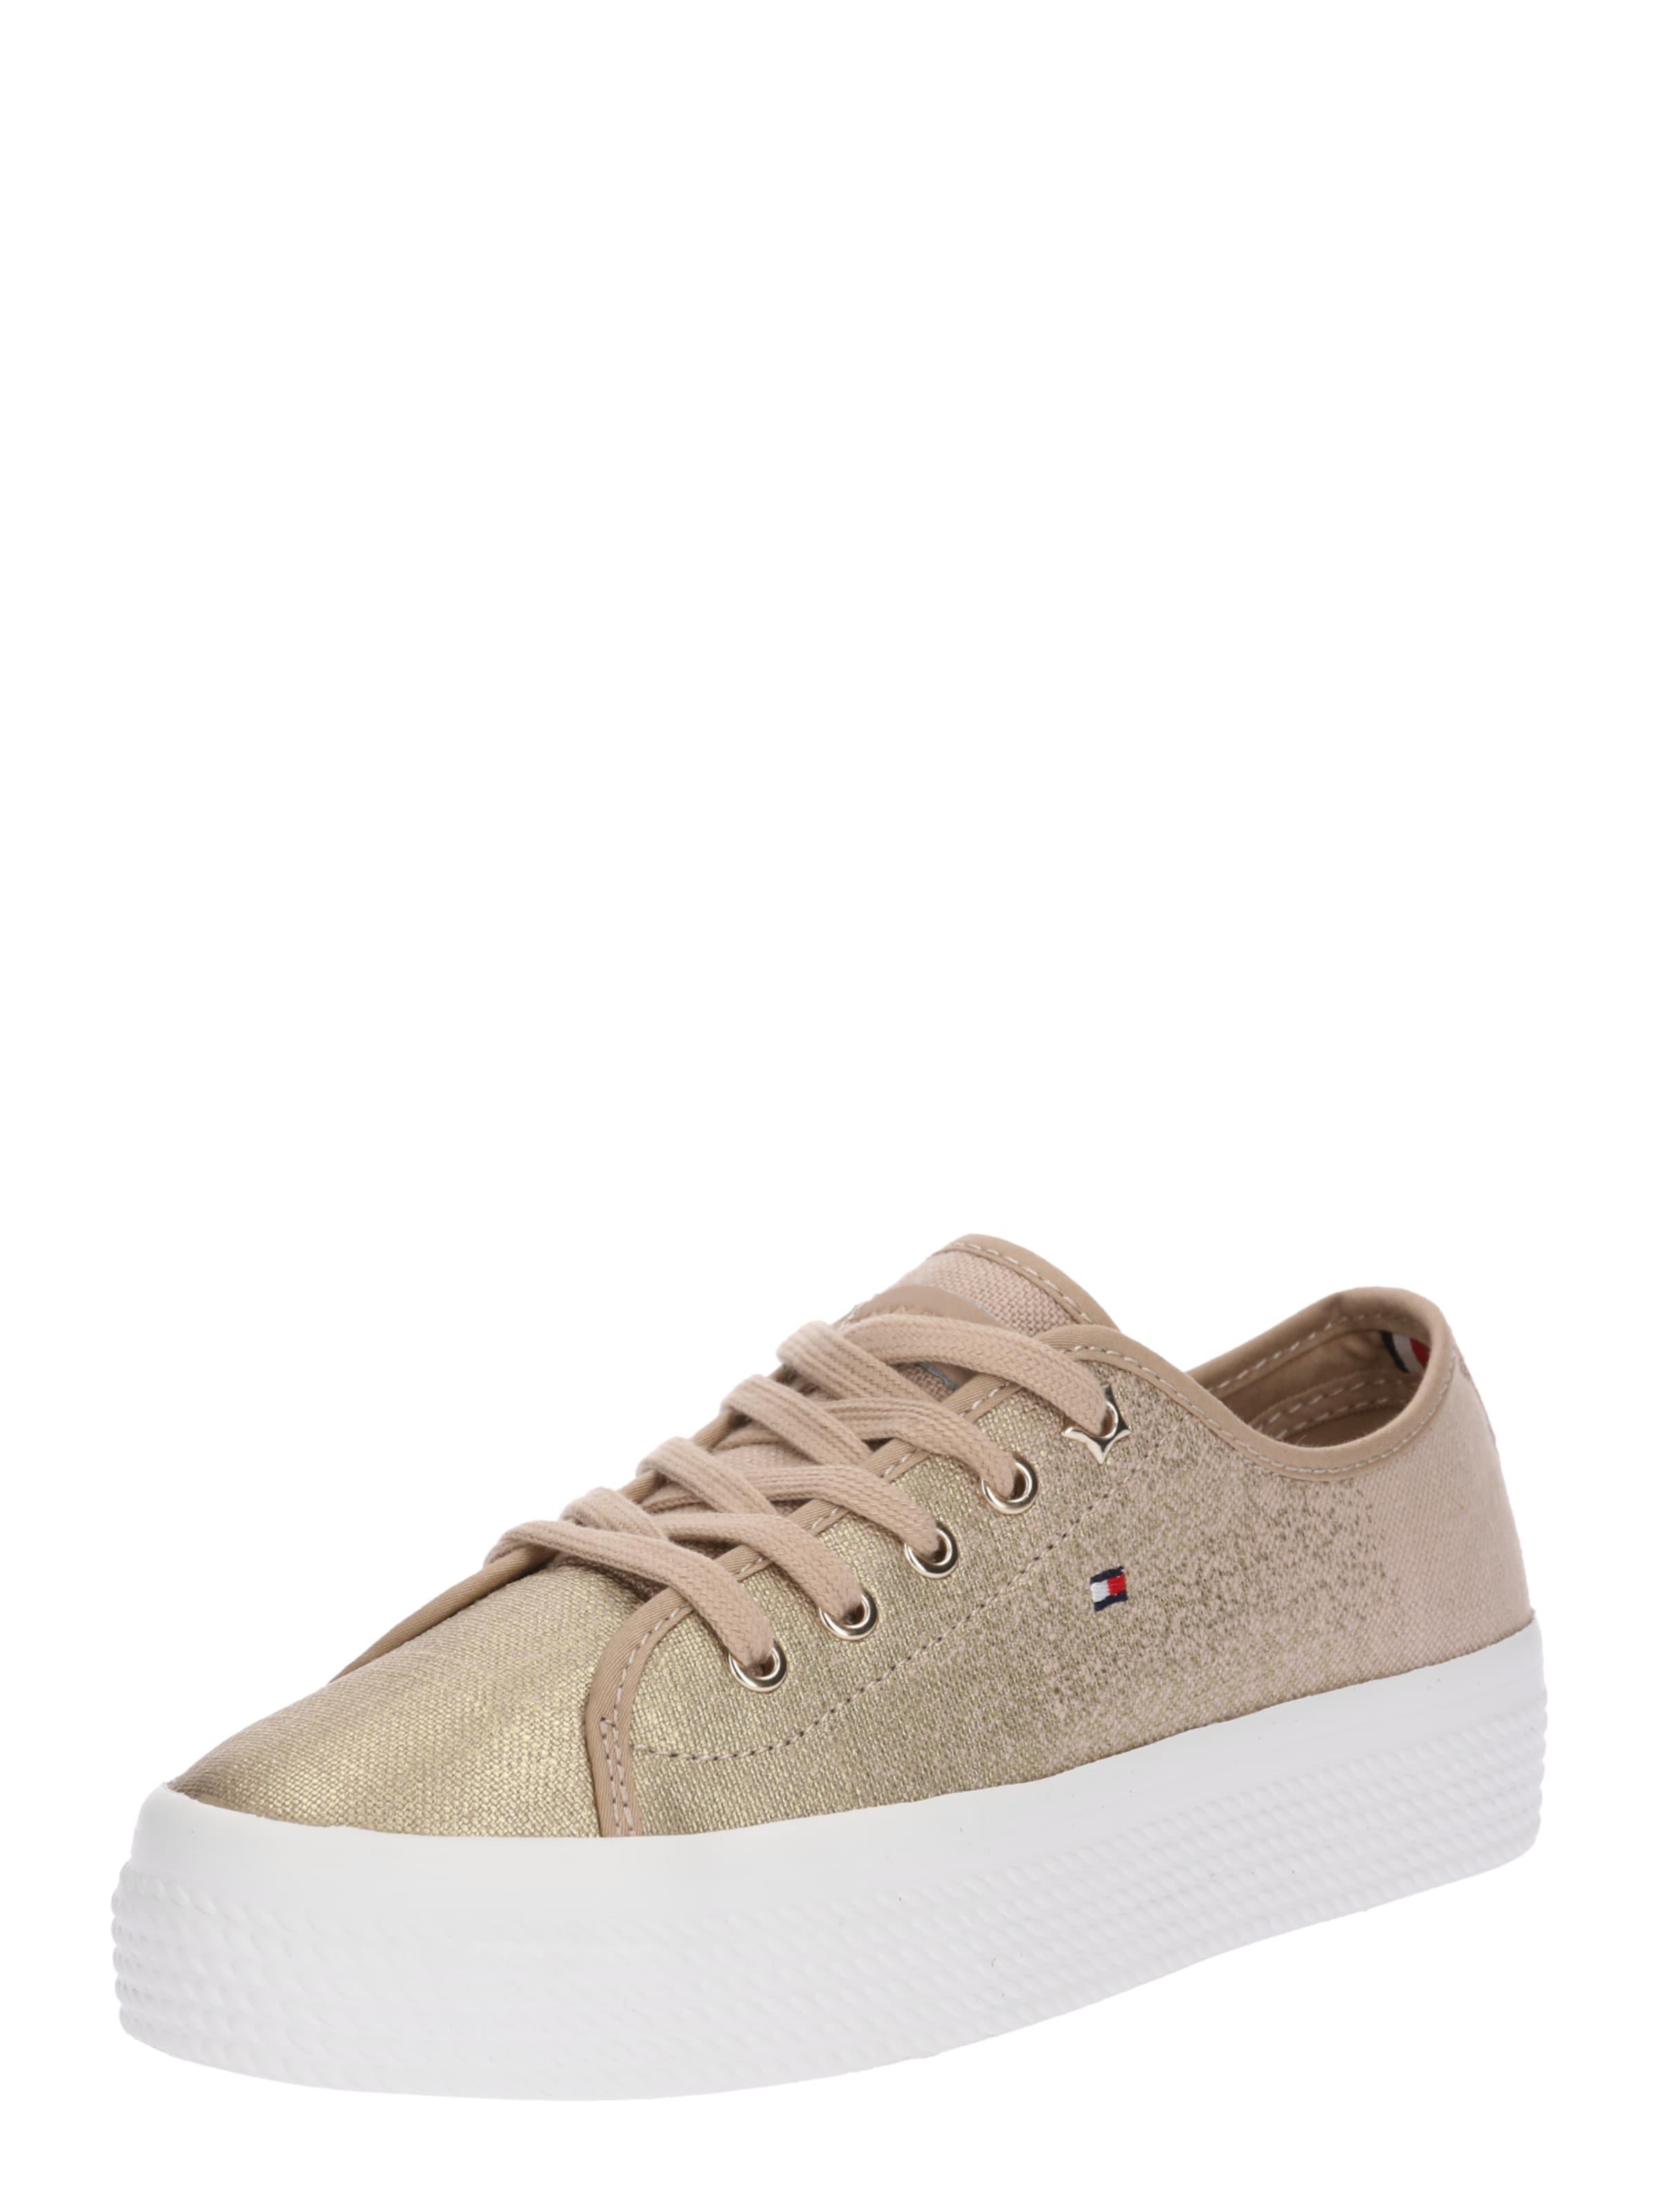 TOMMY HILFIGER Plateau-Sneaker Verschleißfeste billige Schuhe